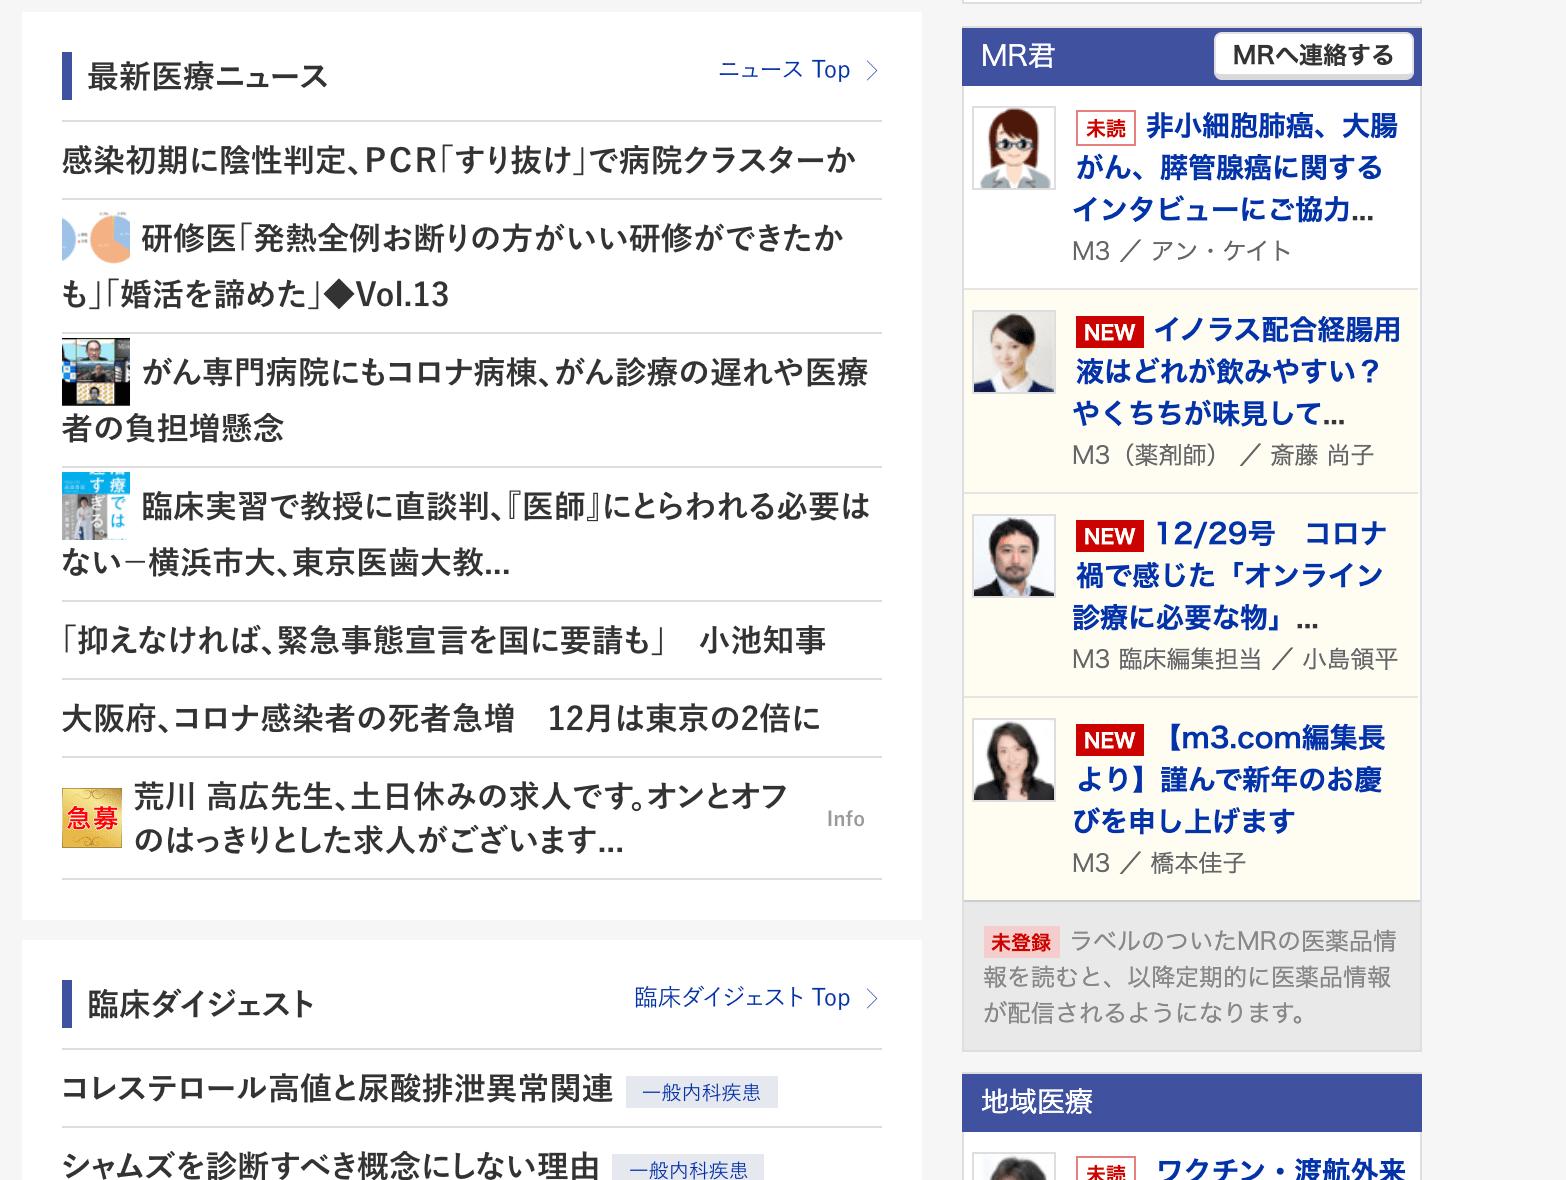 M3.com(エムスリードットコム)総合情報